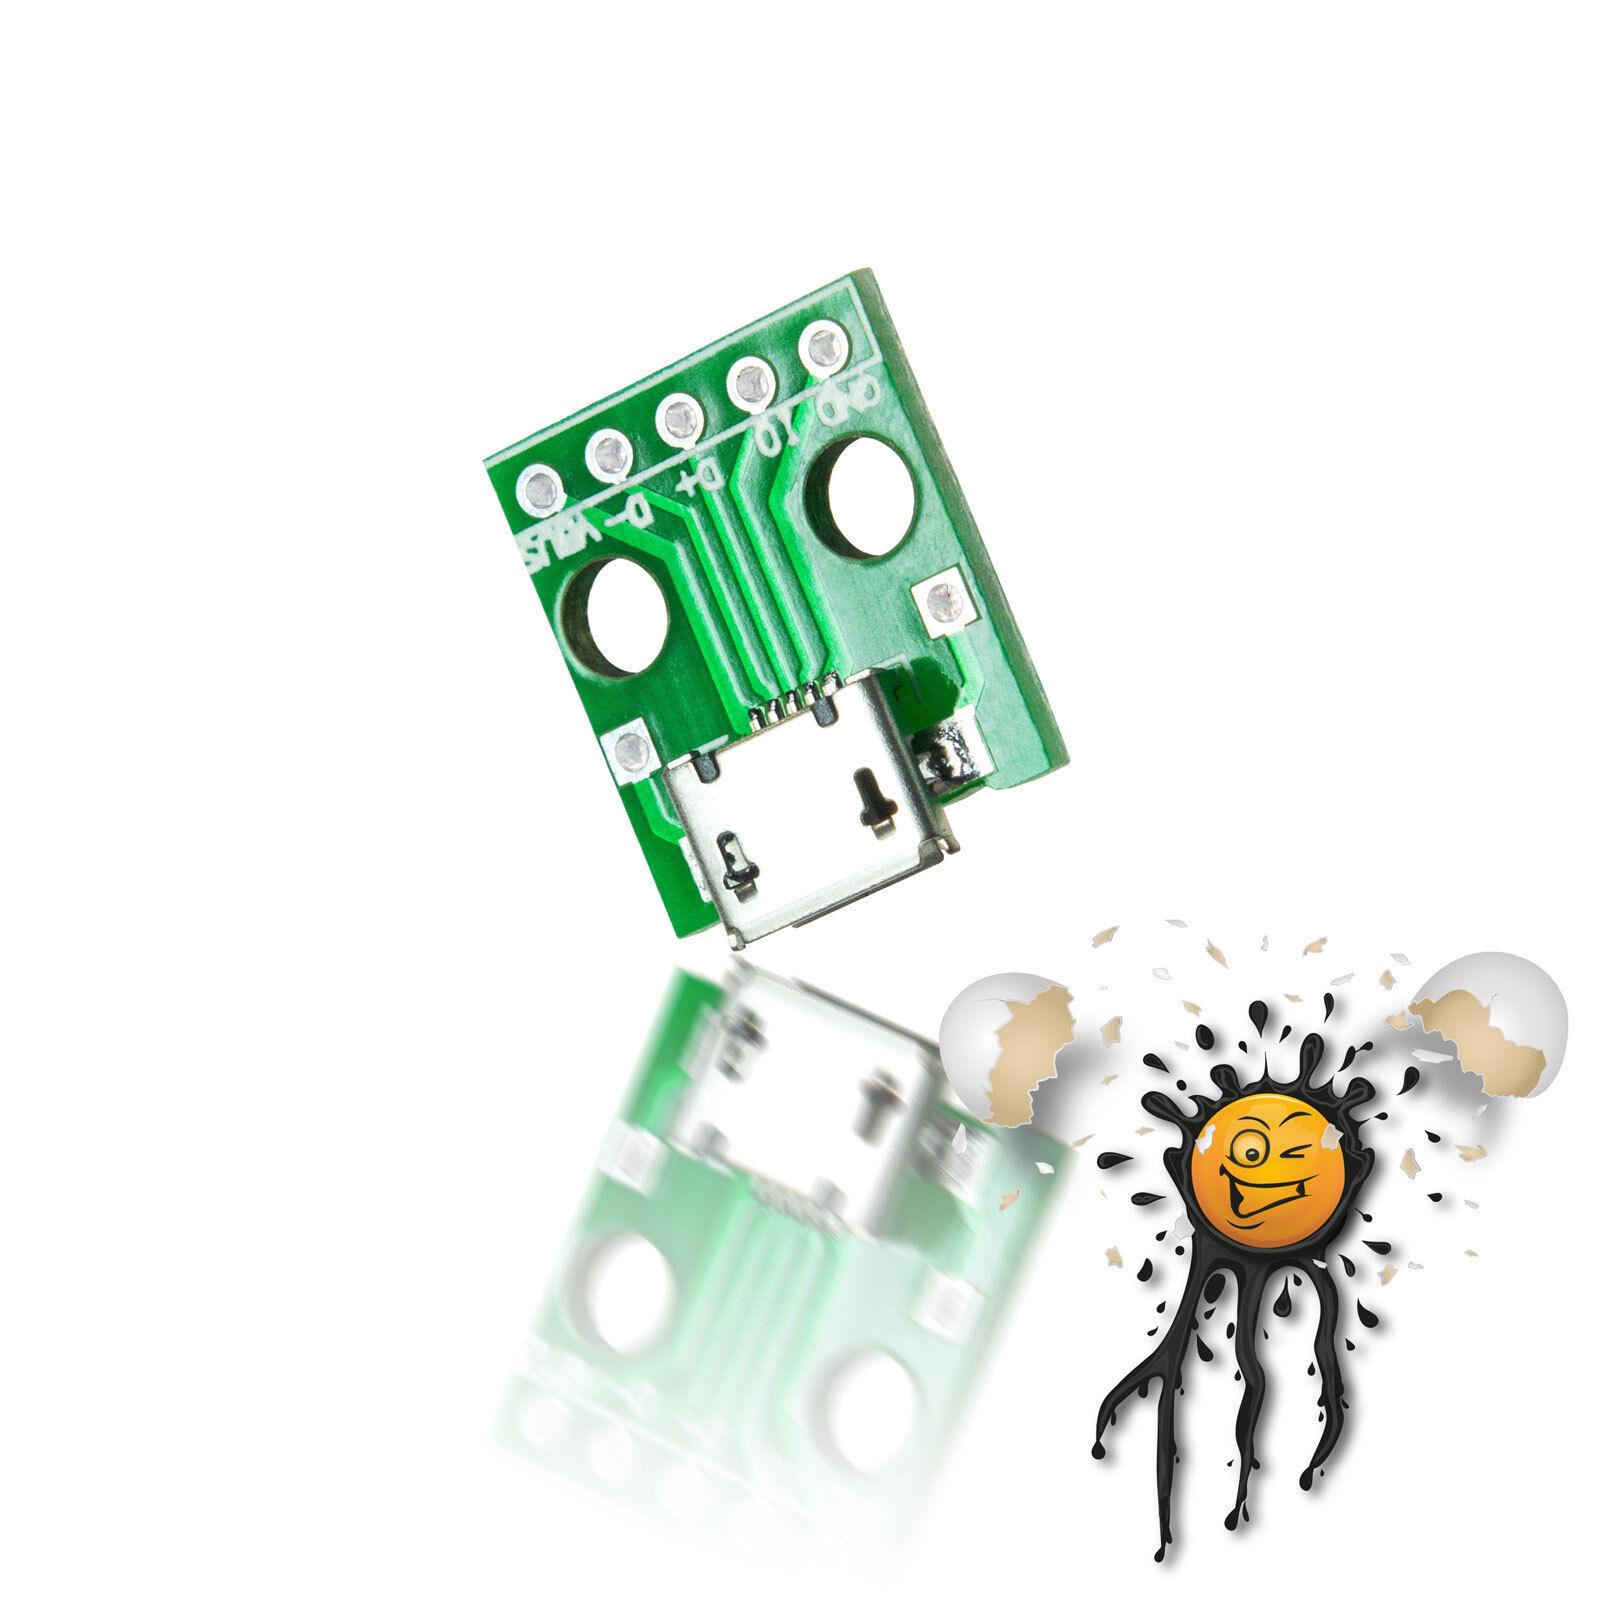 Internet of Things ESP8266 MB102 Steckplatine IoT Testboard Breadboard Arduino